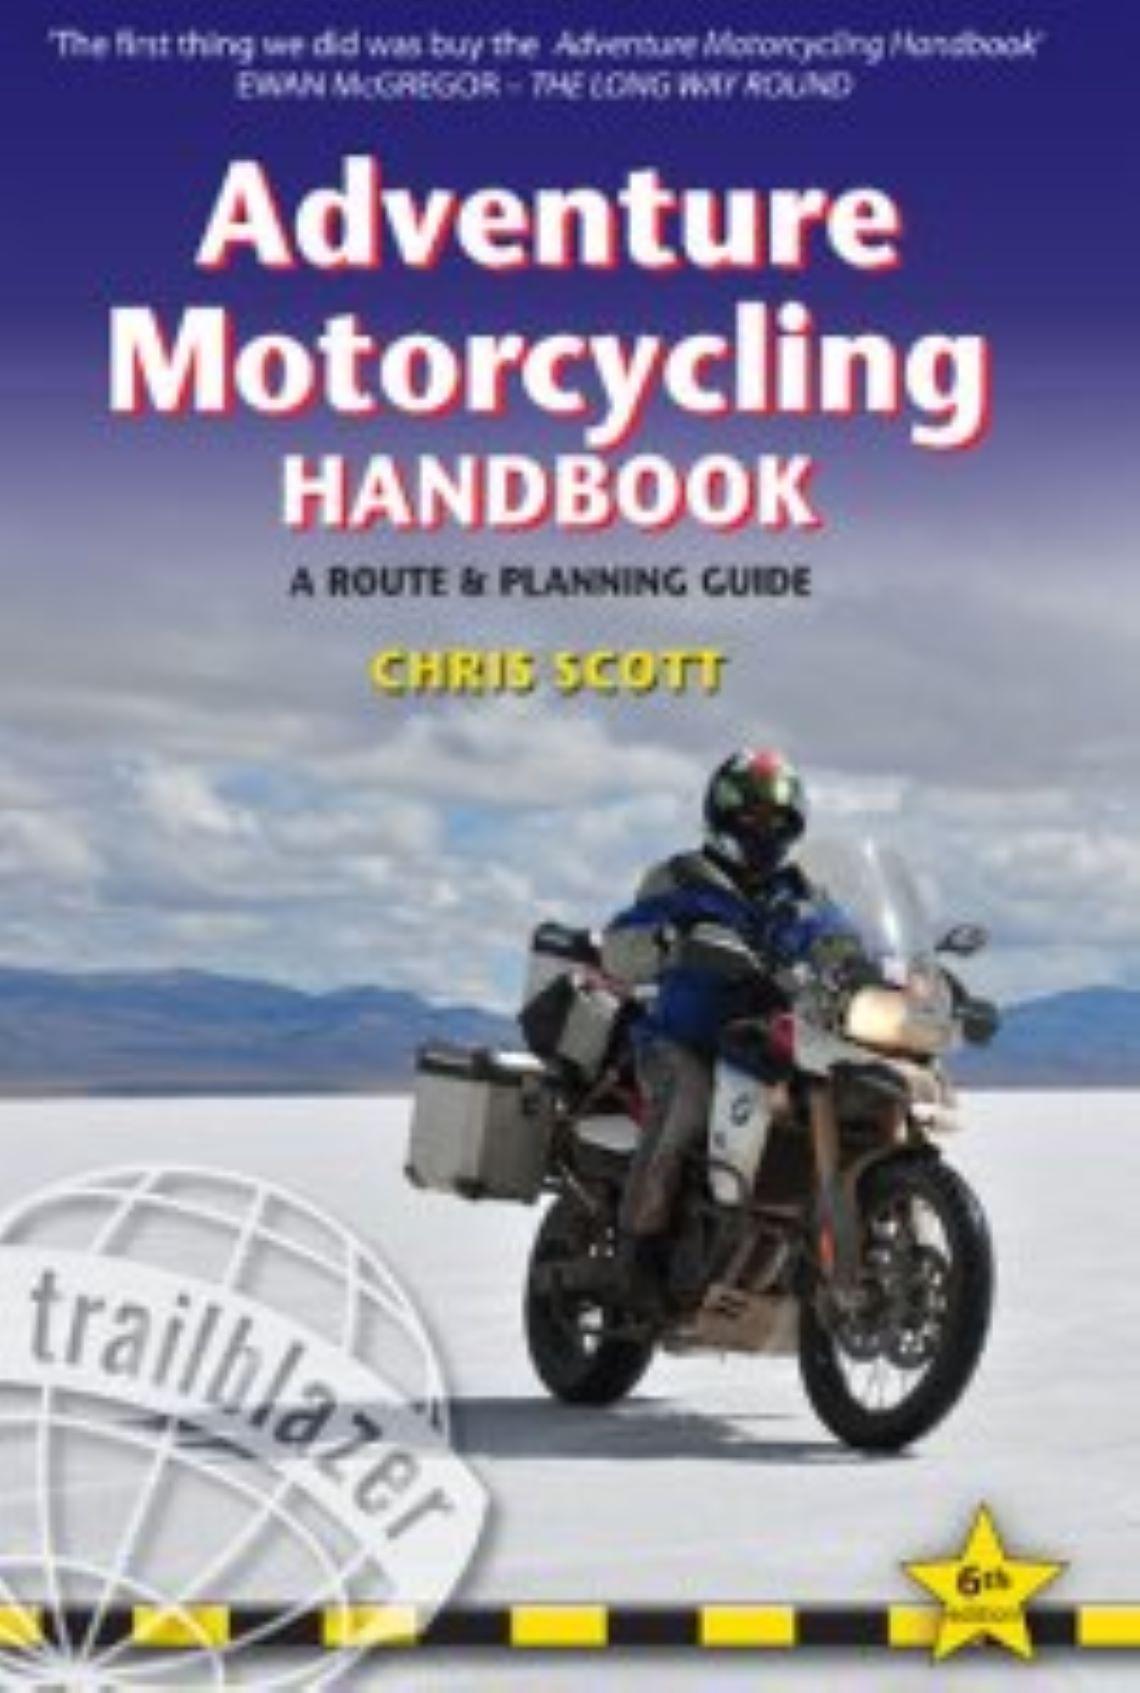 adventure-motorcycling-handbook